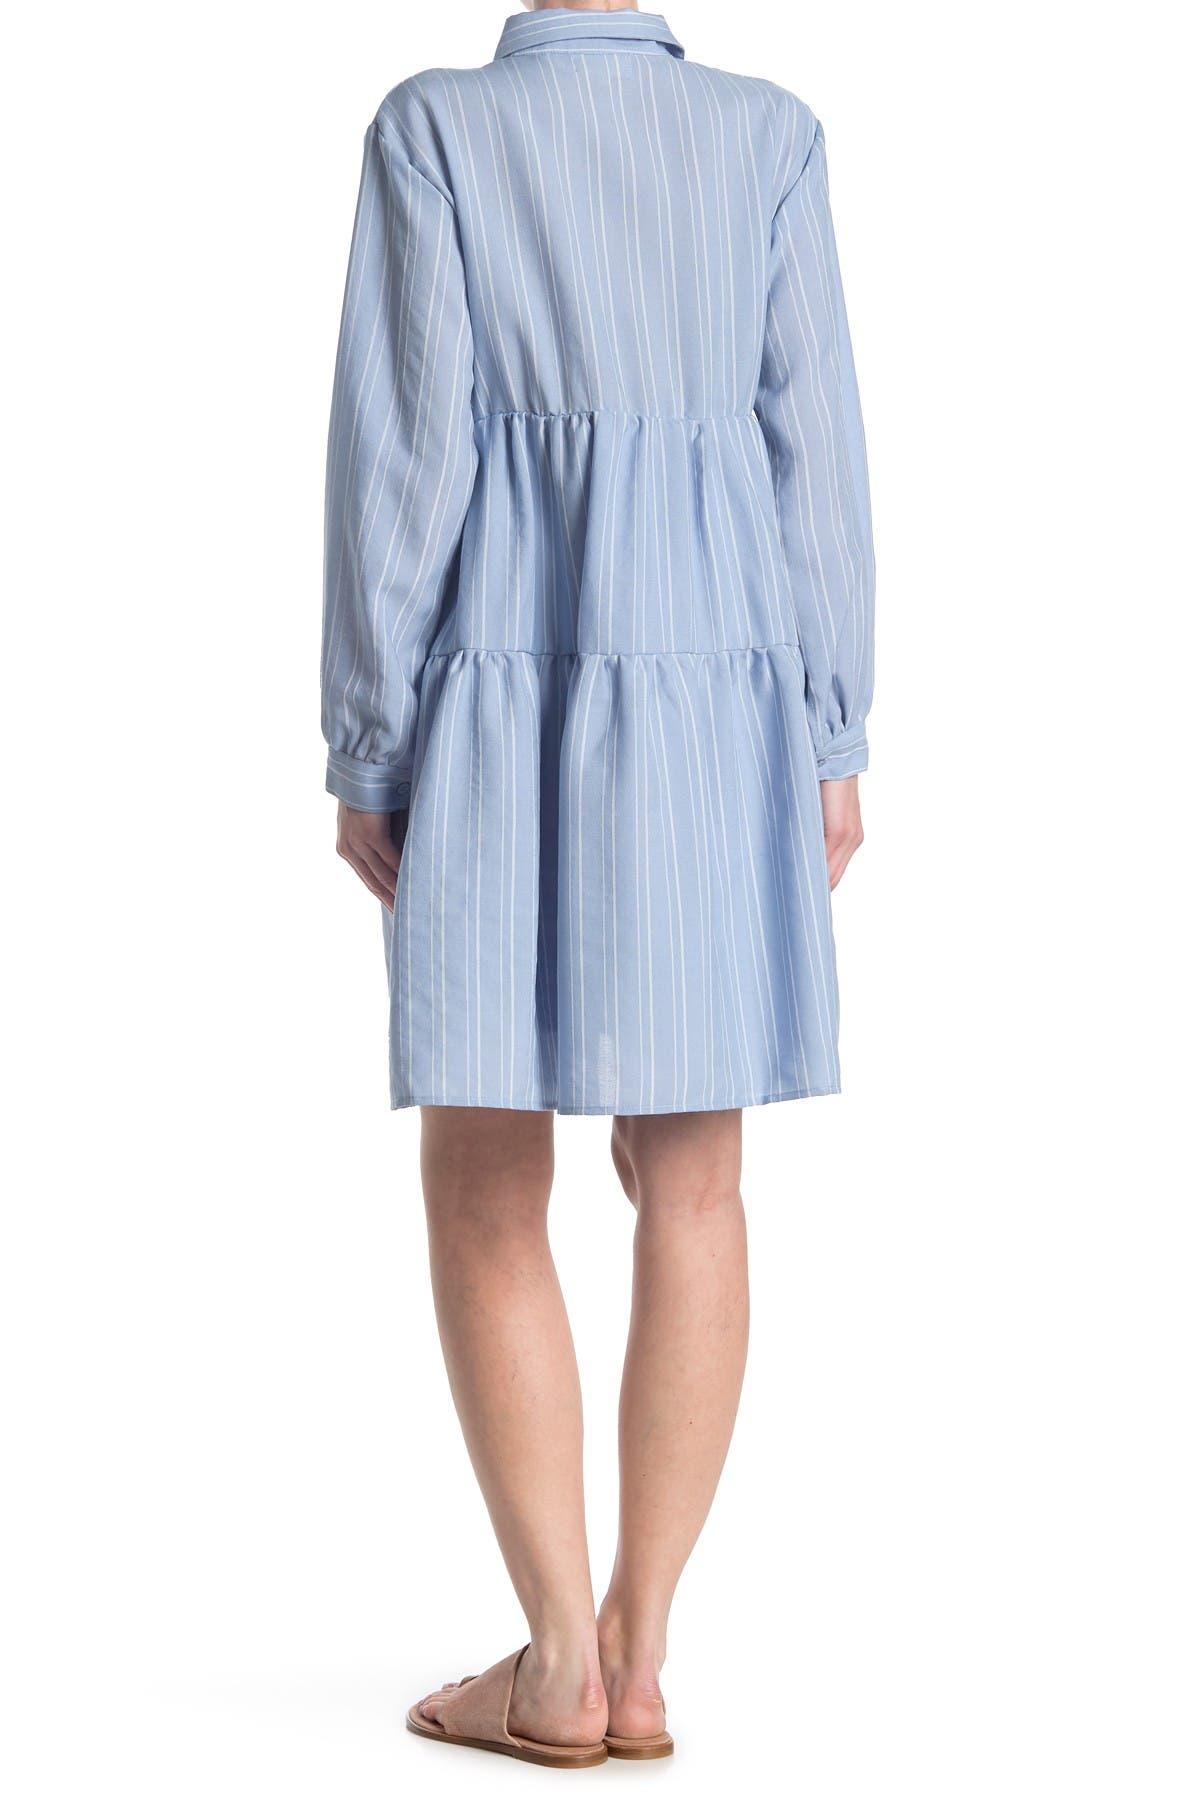 Melloday Long Sleeve Babydoll Dress In Medium Blue